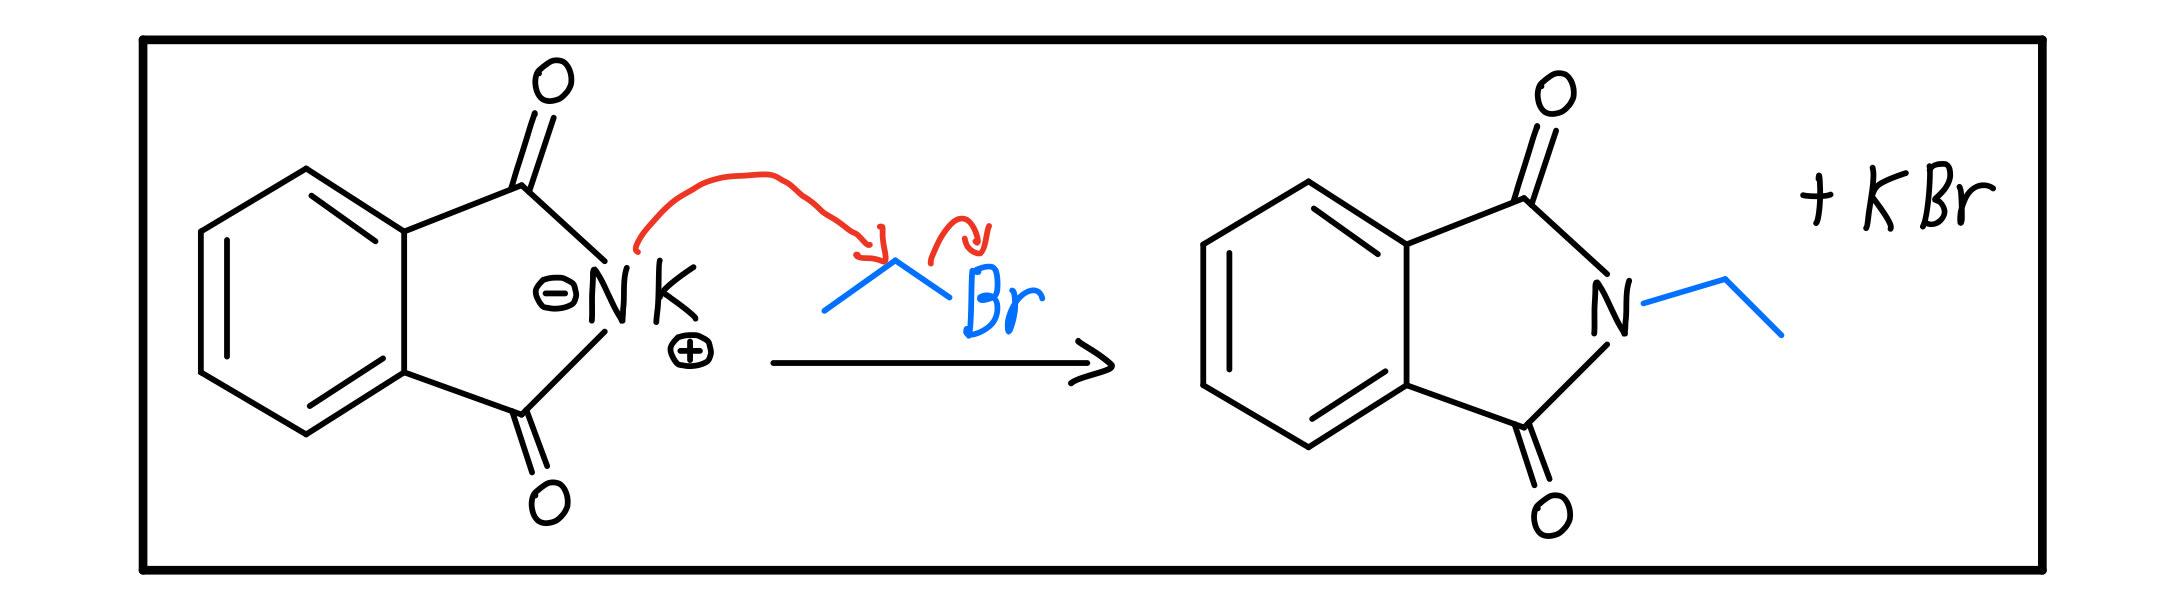 Nitrogen alkylation